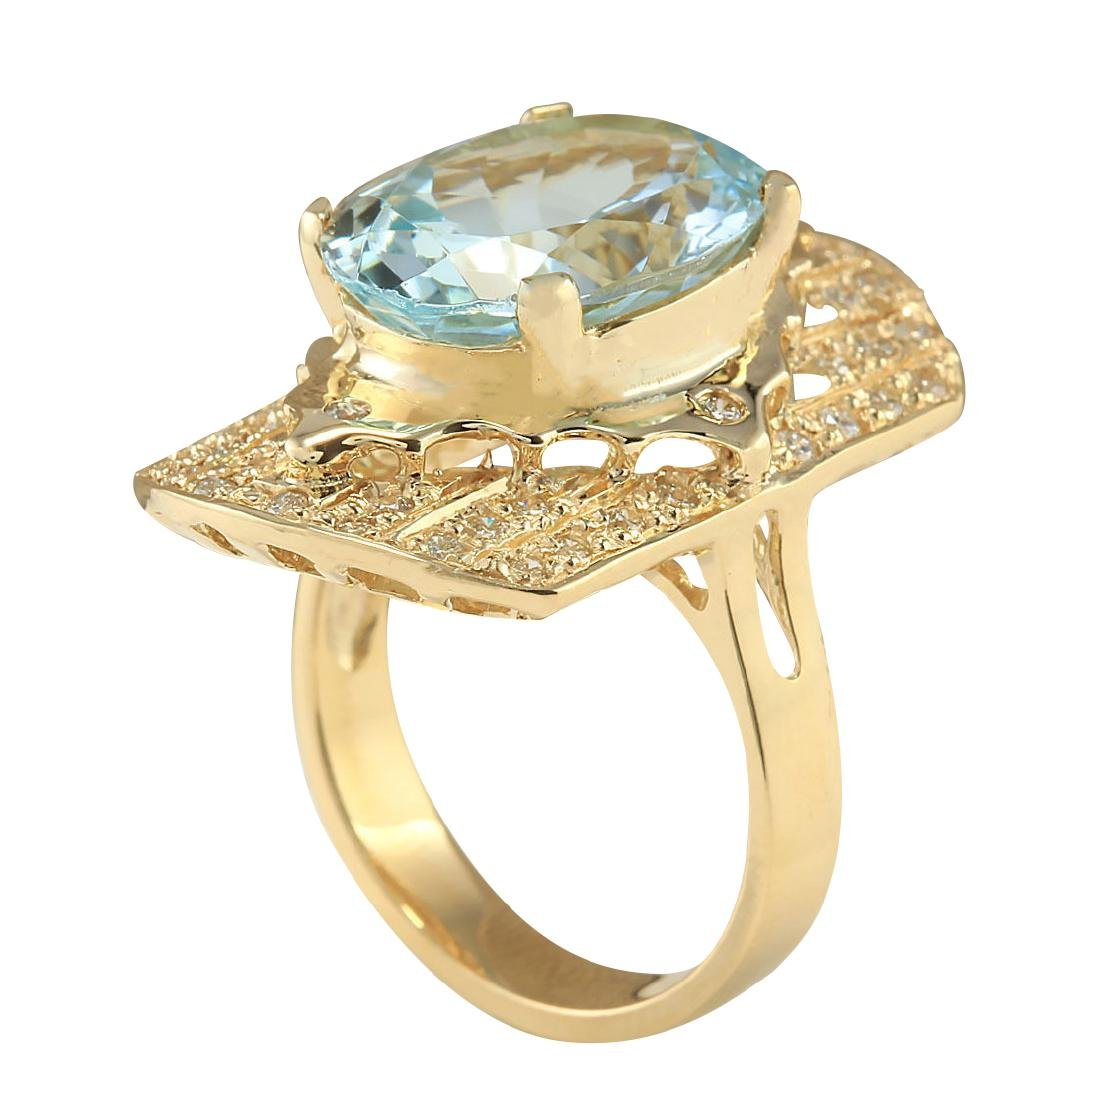 7.35CTW Natural Aquamarine And Diamond Ring In 18K - 3